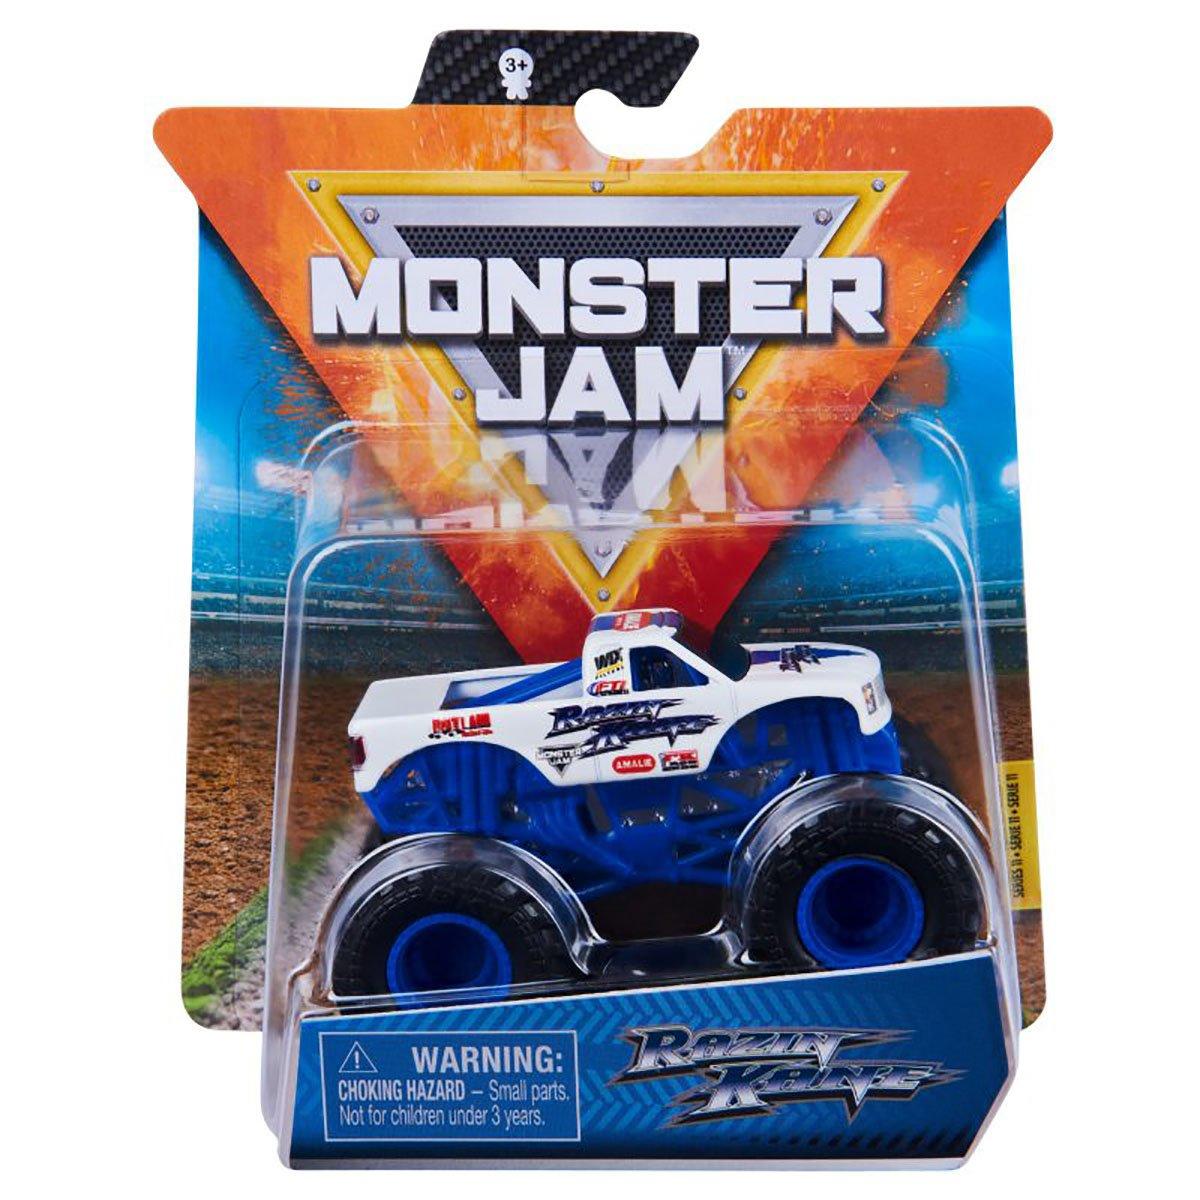 Masinuta Monster Jam, Scara 1:64, Razin Kane, Albastru